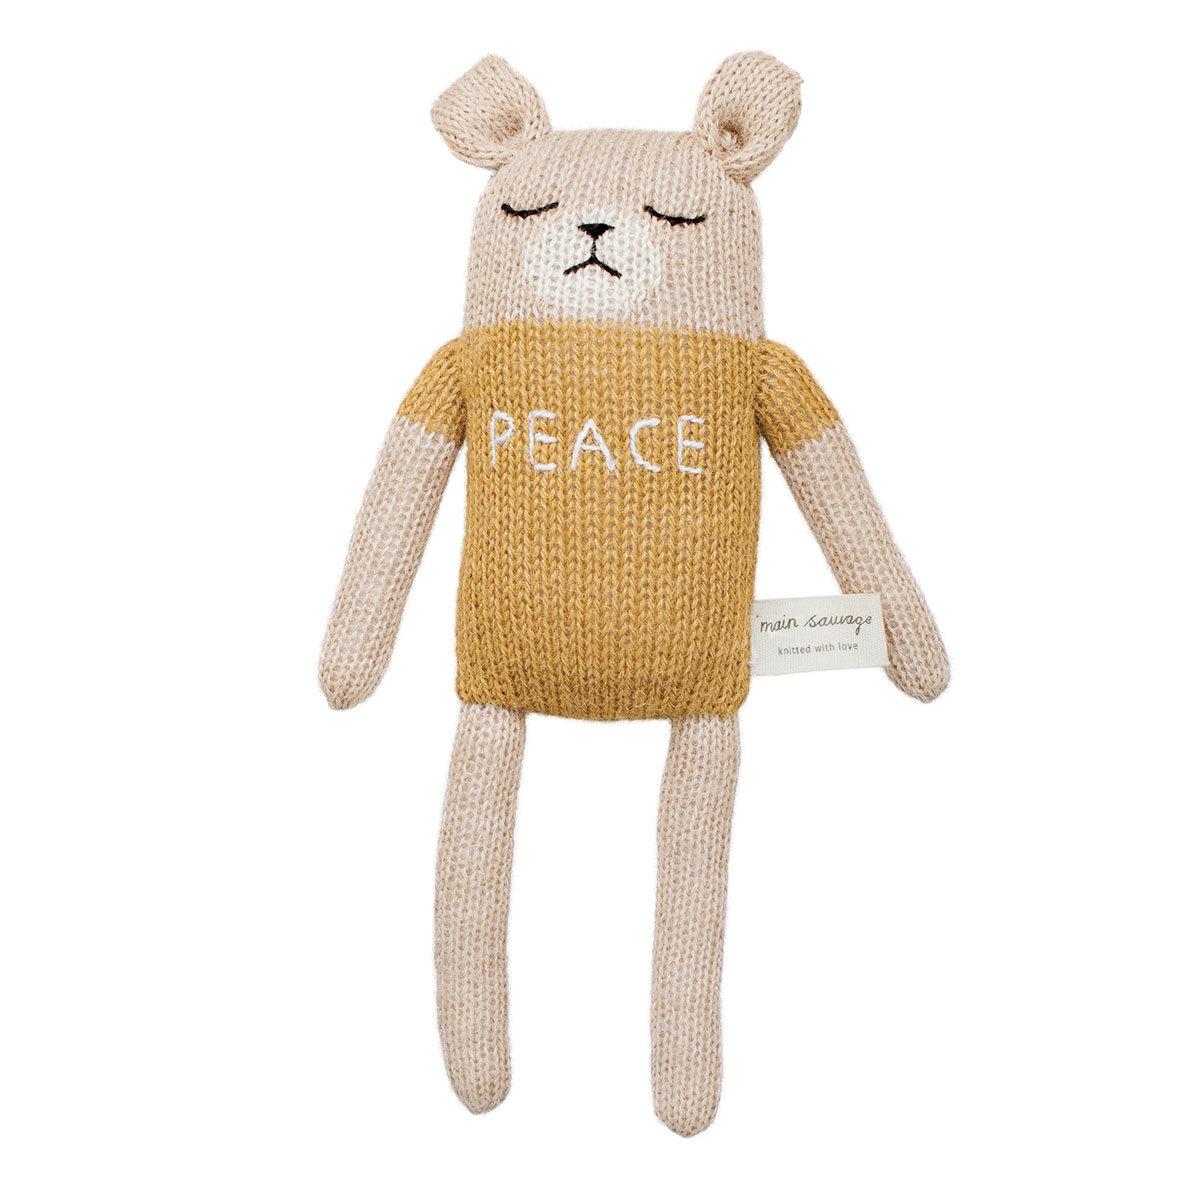 Doudou Soft Toy Teddy Mustard